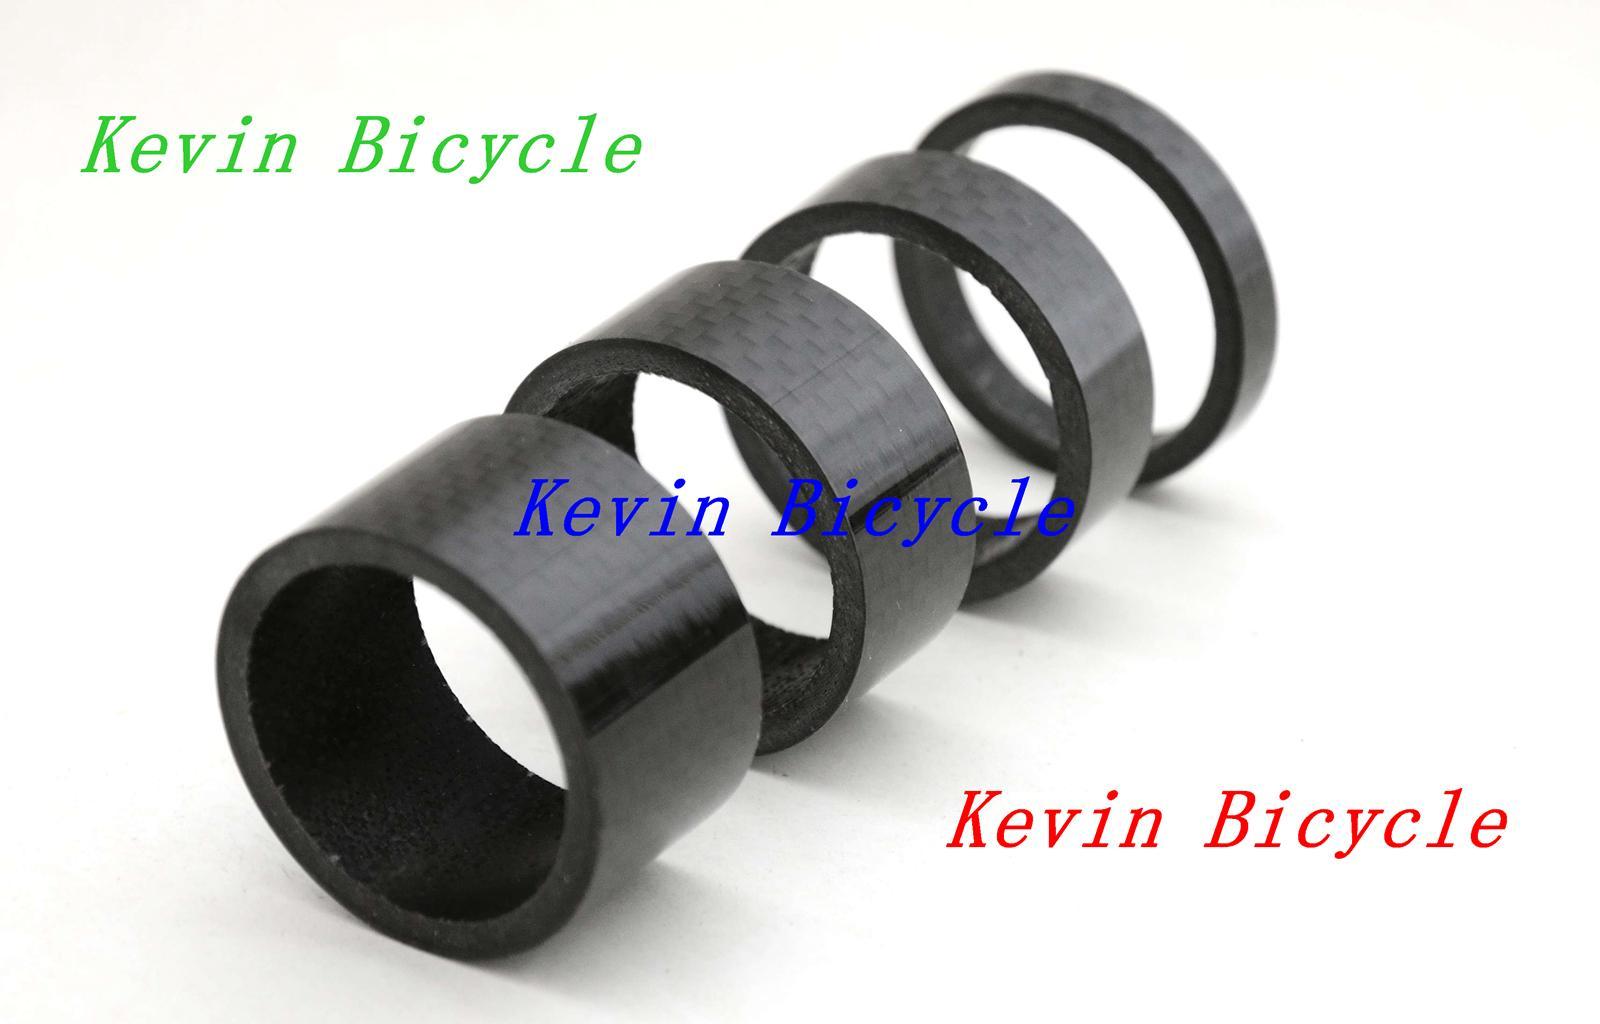 Full carbon bike headset spacer, ultra light, 4 pcs a set Fits 1-1/8